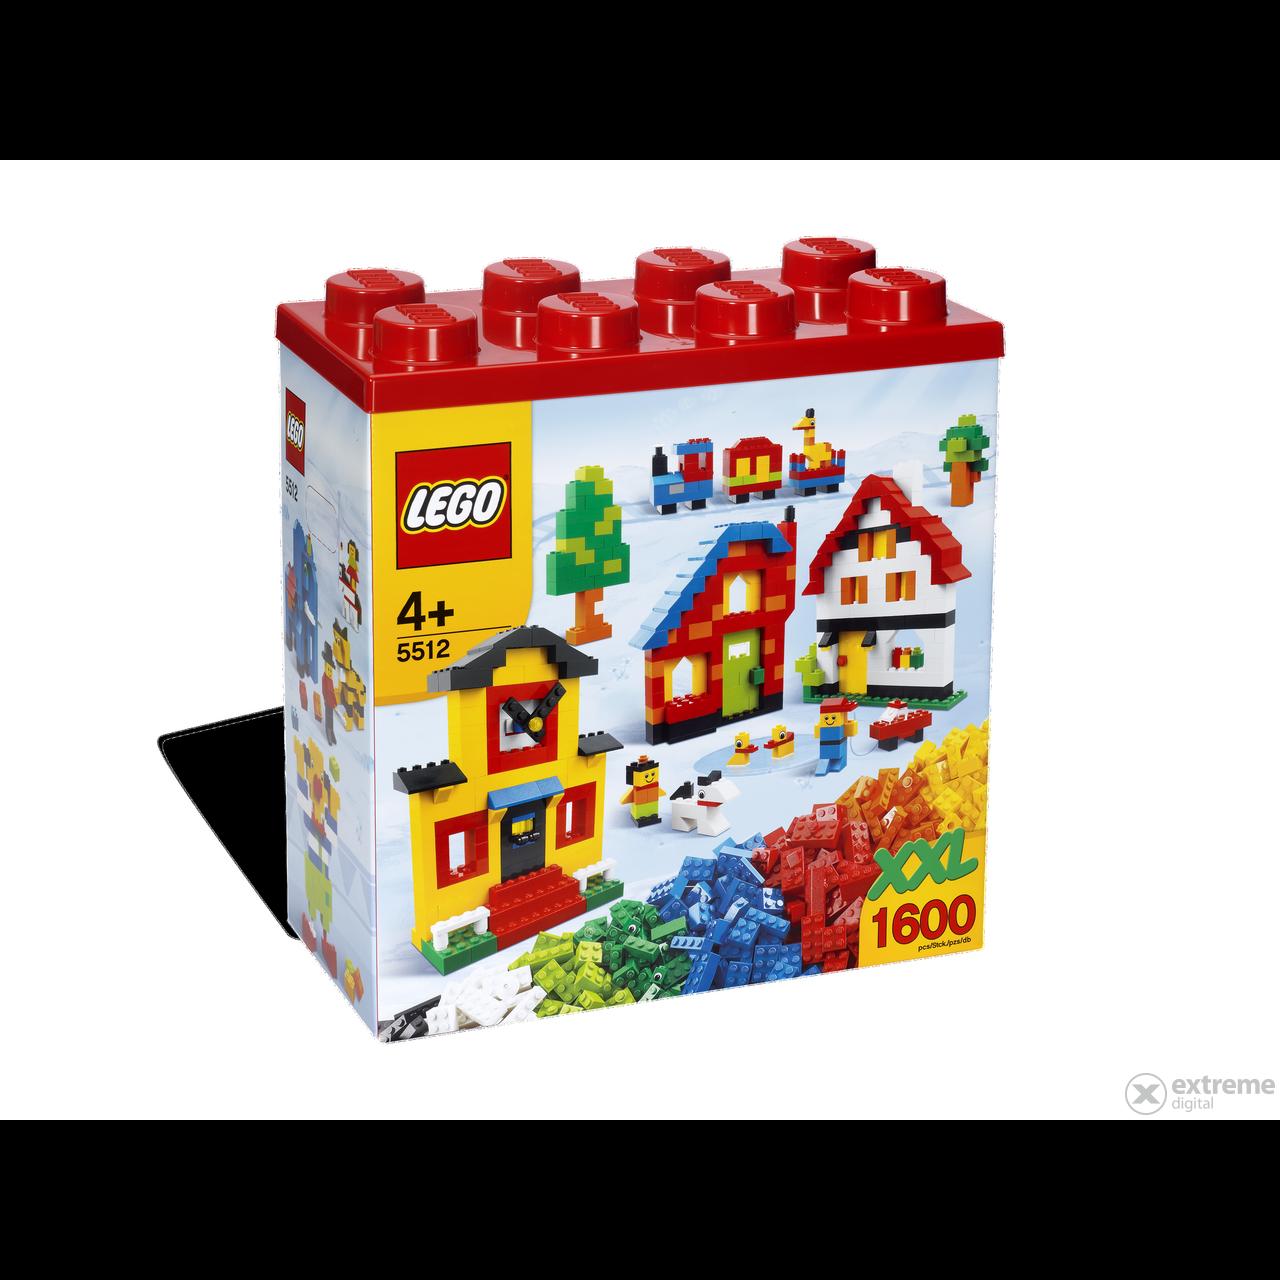 Lego Xxl Box